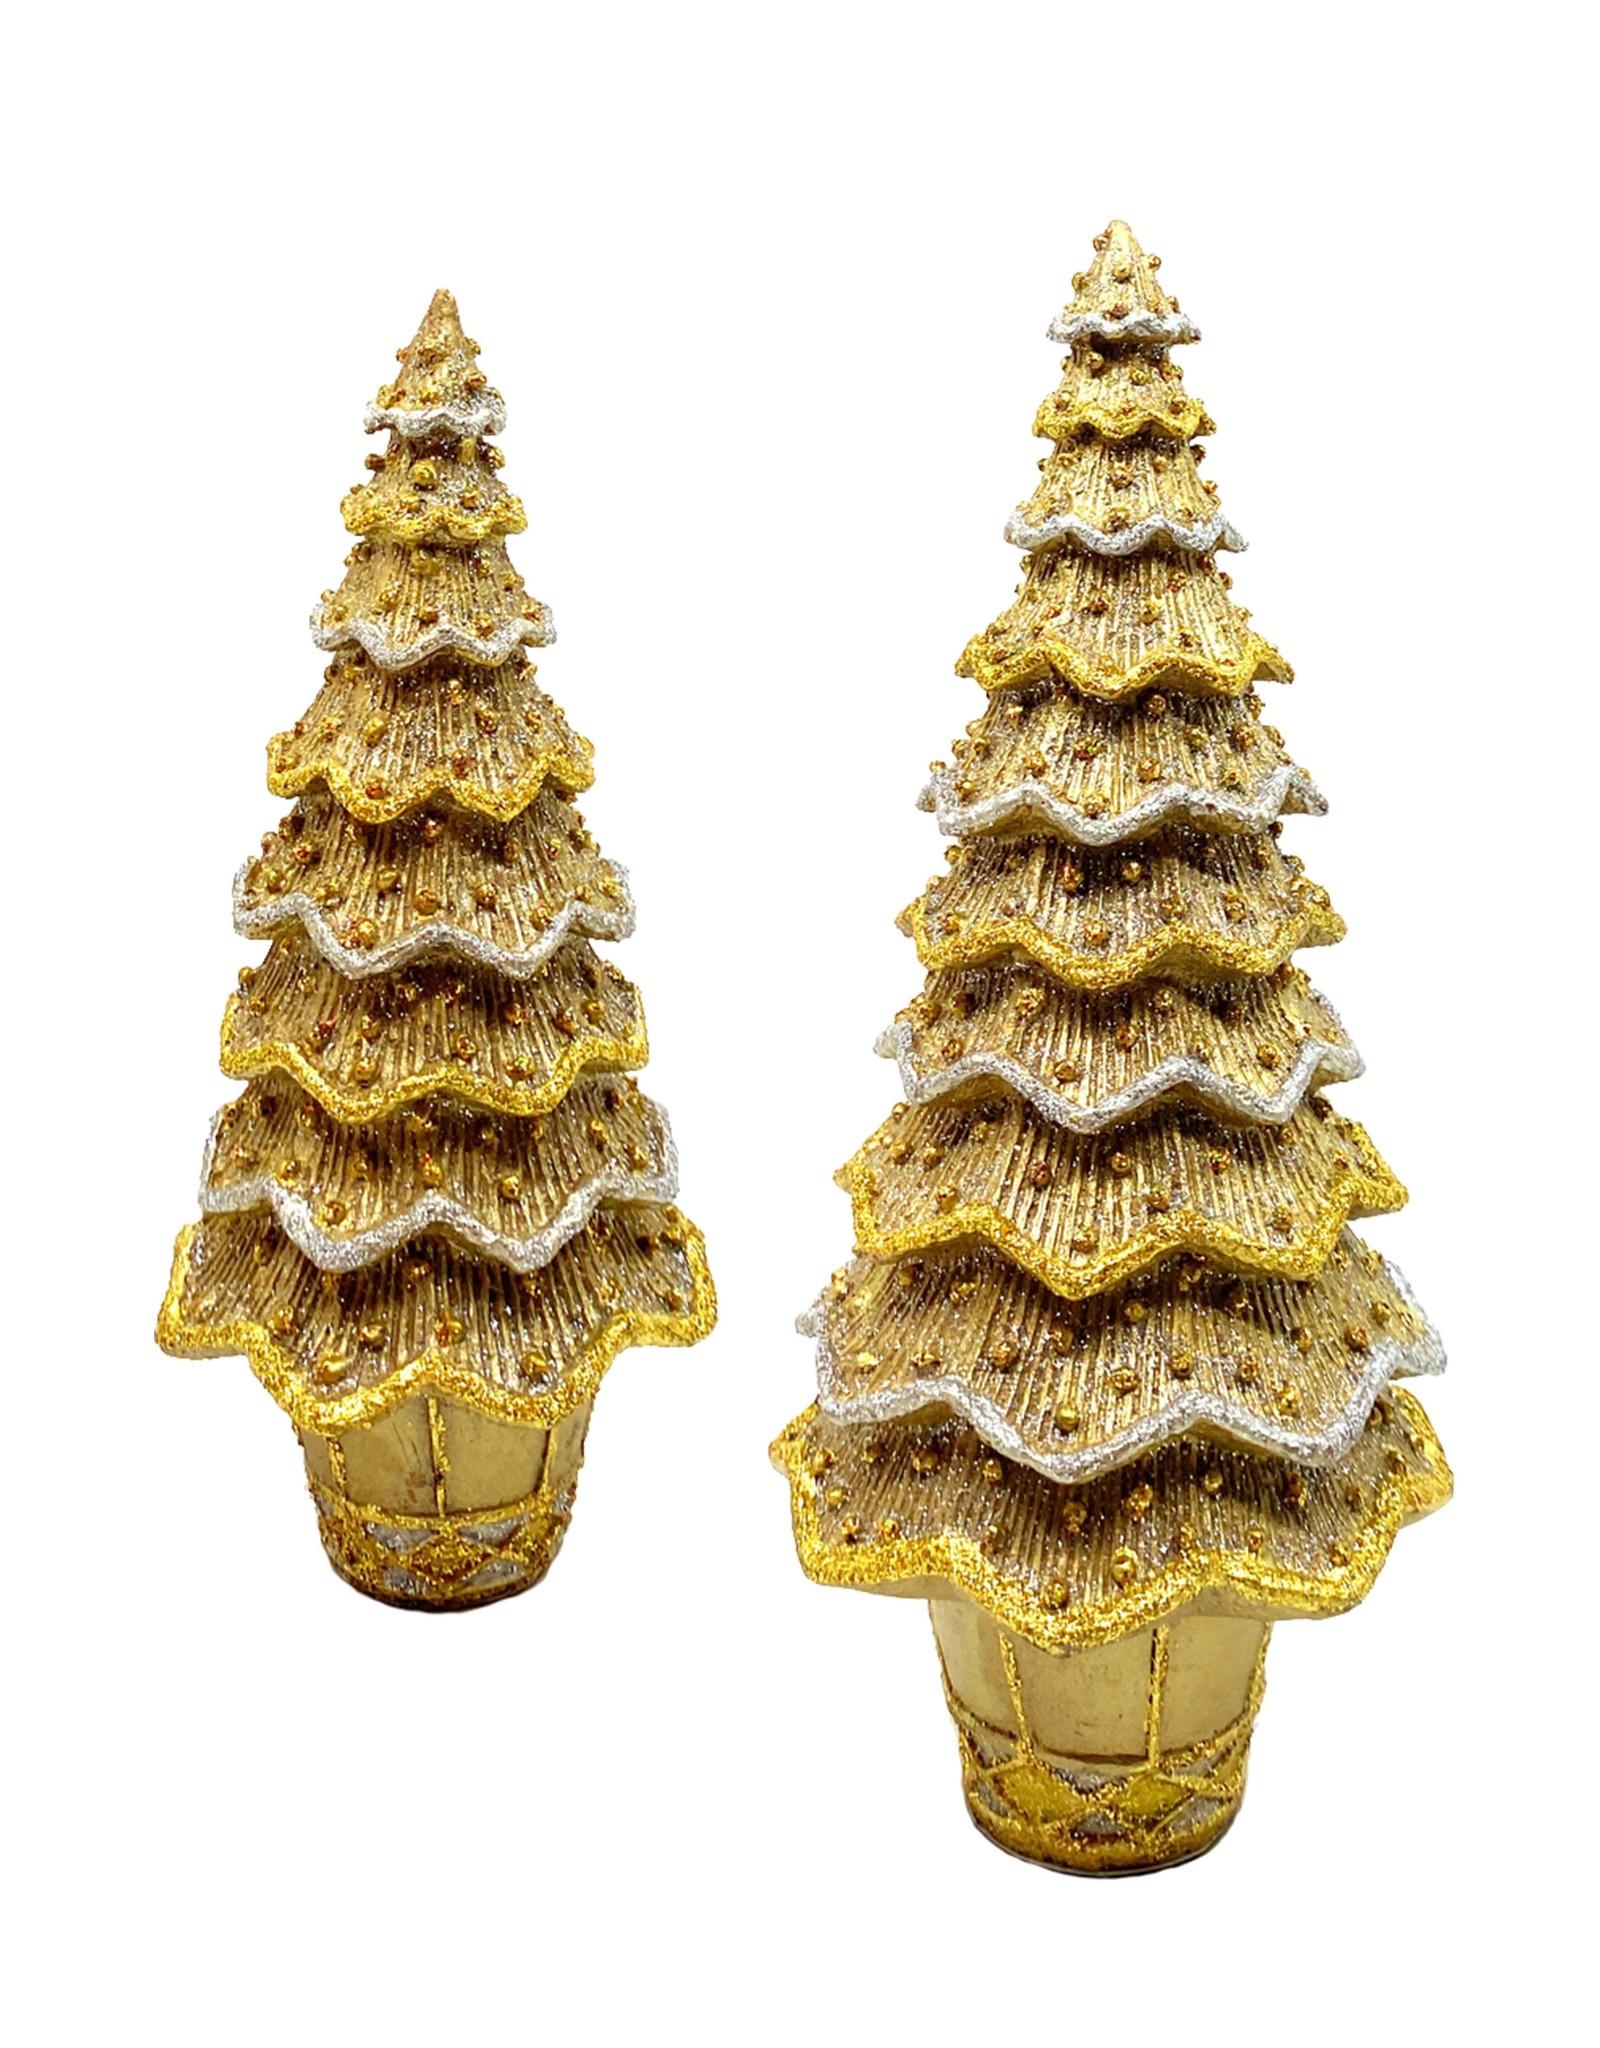 DEKORASYON MEDIUM LAYERED BEADED NEO CONE TREE